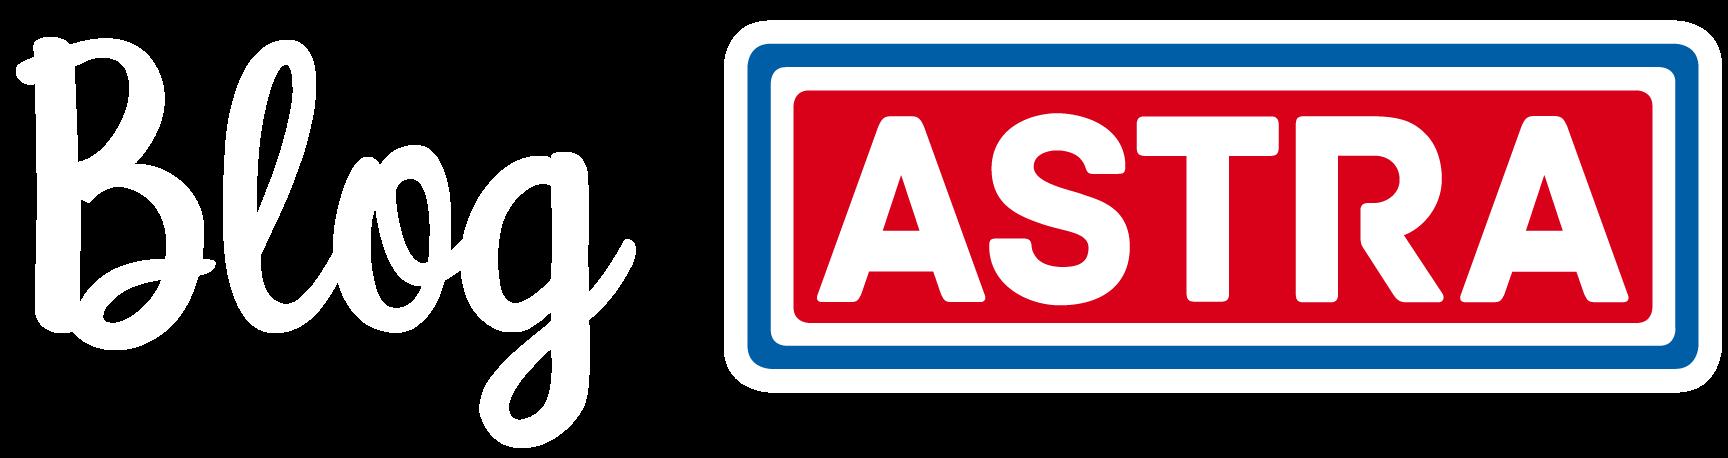 Blog Astra